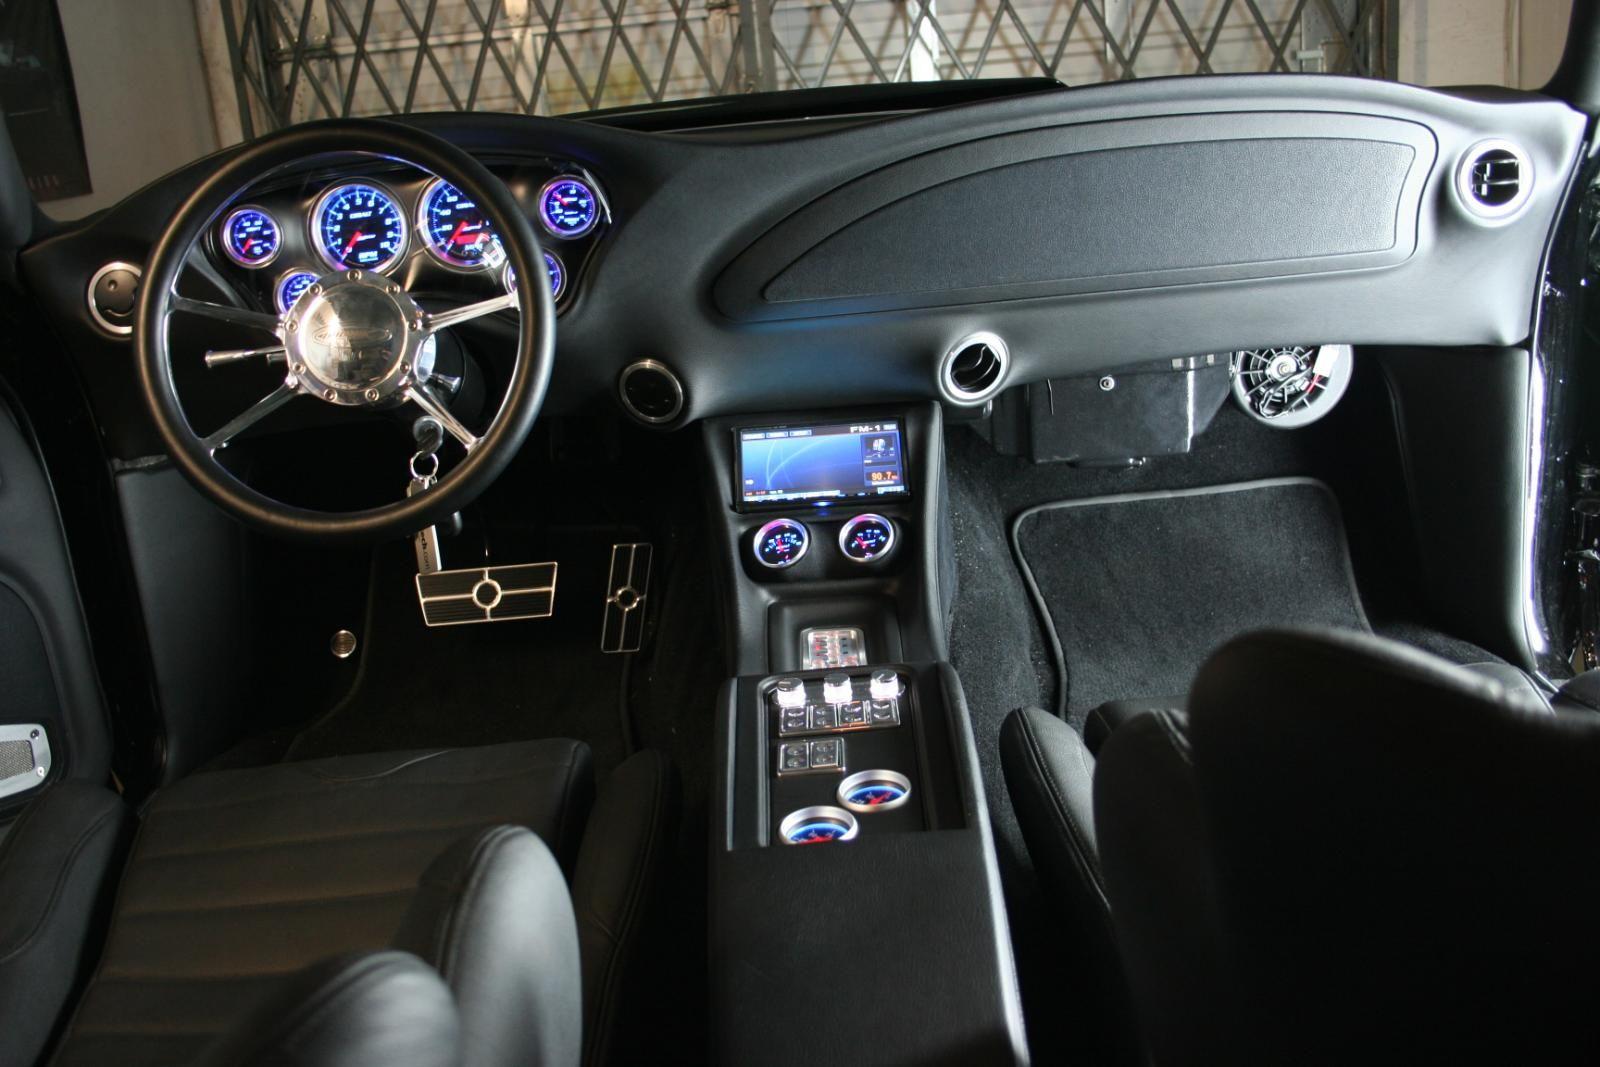 hight resolution of chevelle interior 1970 chevelle custom dash and interior pics